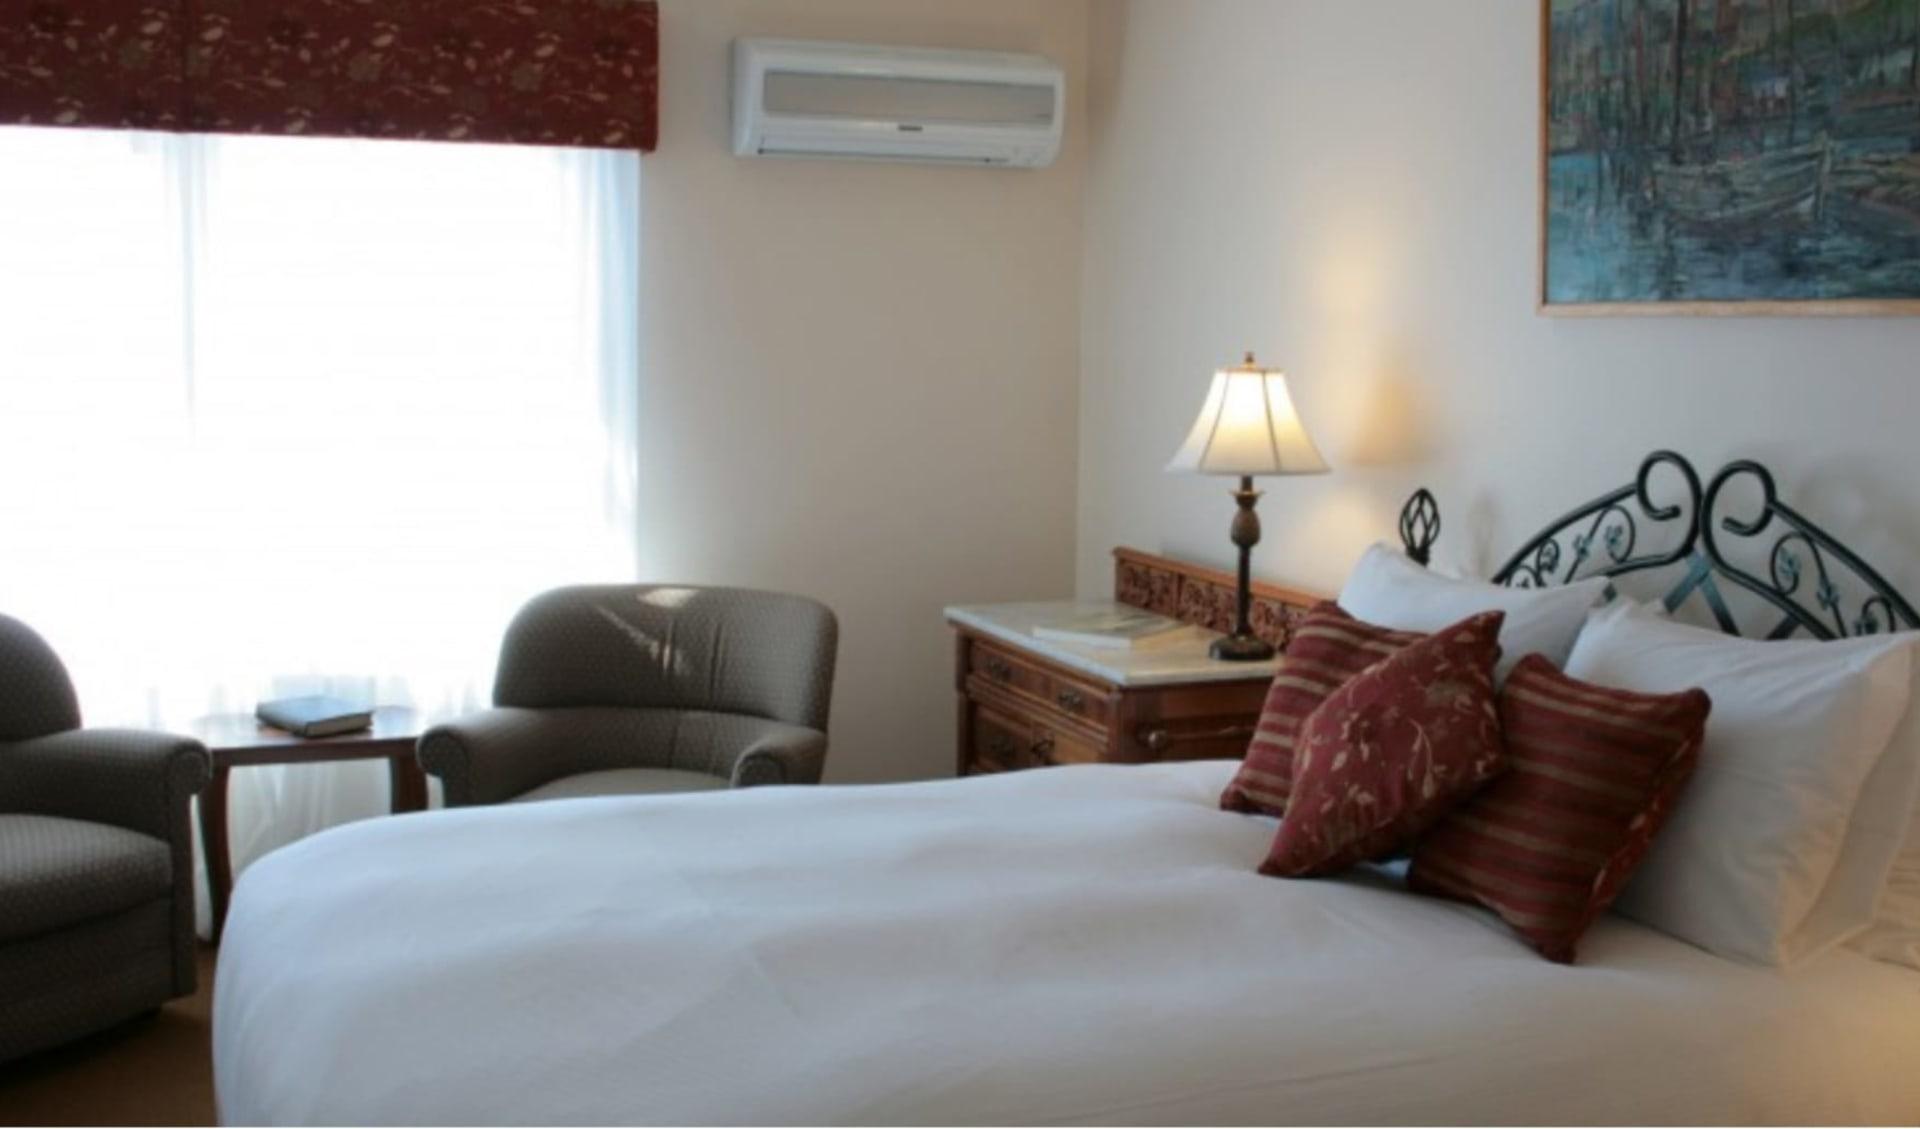 Rossmount Inn Hotel Restaurant and Bar in St. Andrews-by-the-Sea: Standard Queen Bett Zimmer